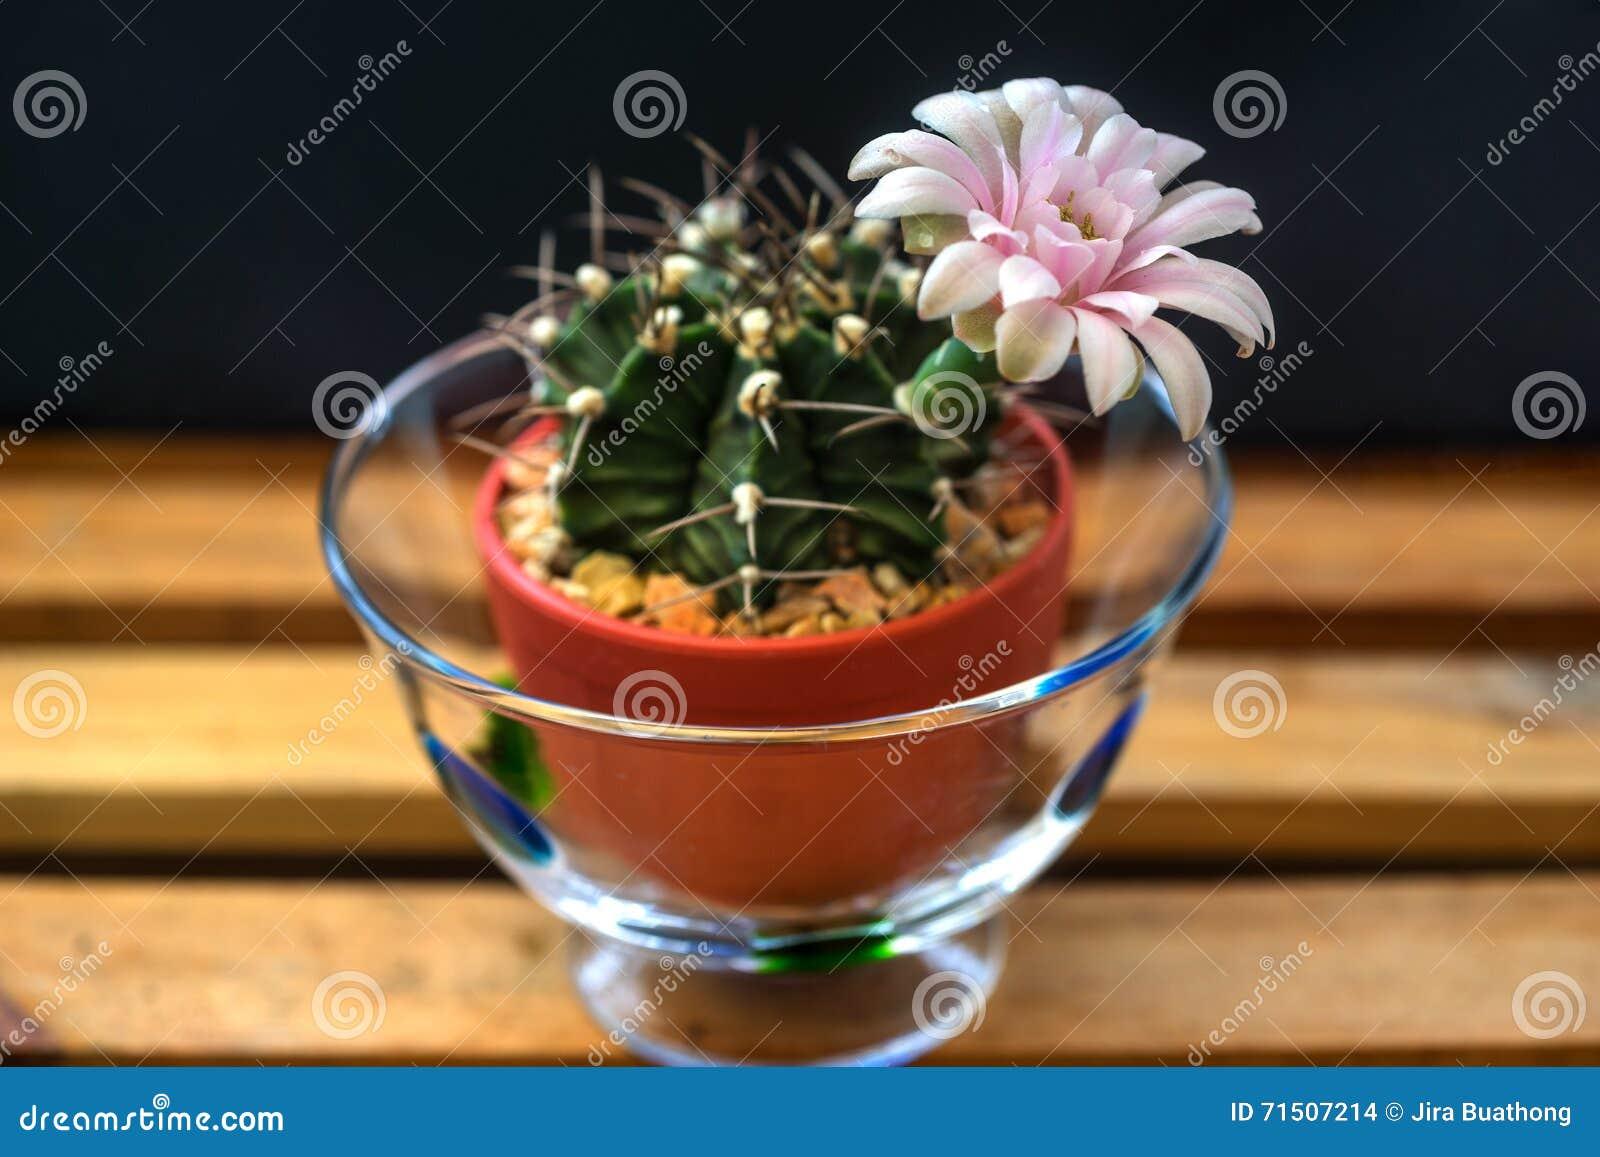 home decoration of cactus flower stock photo image 71507214. Black Bedroom Furniture Sets. Home Design Ideas